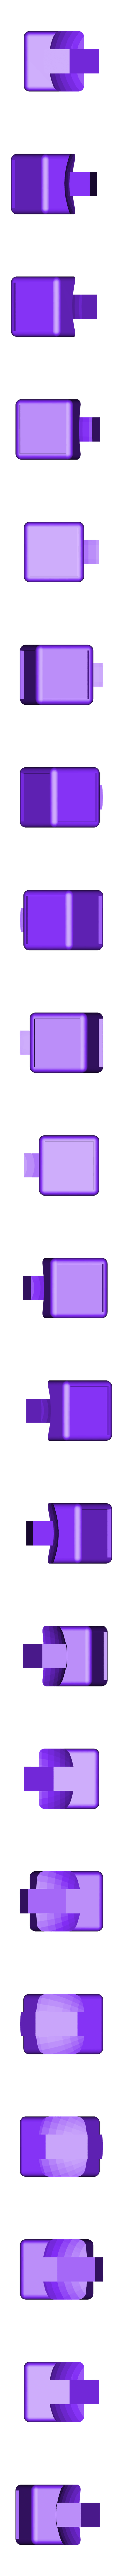 Cardinal_remix.stl Download free STL file Rubik's Cube Remixed • 3D printable design, lowboydrvr